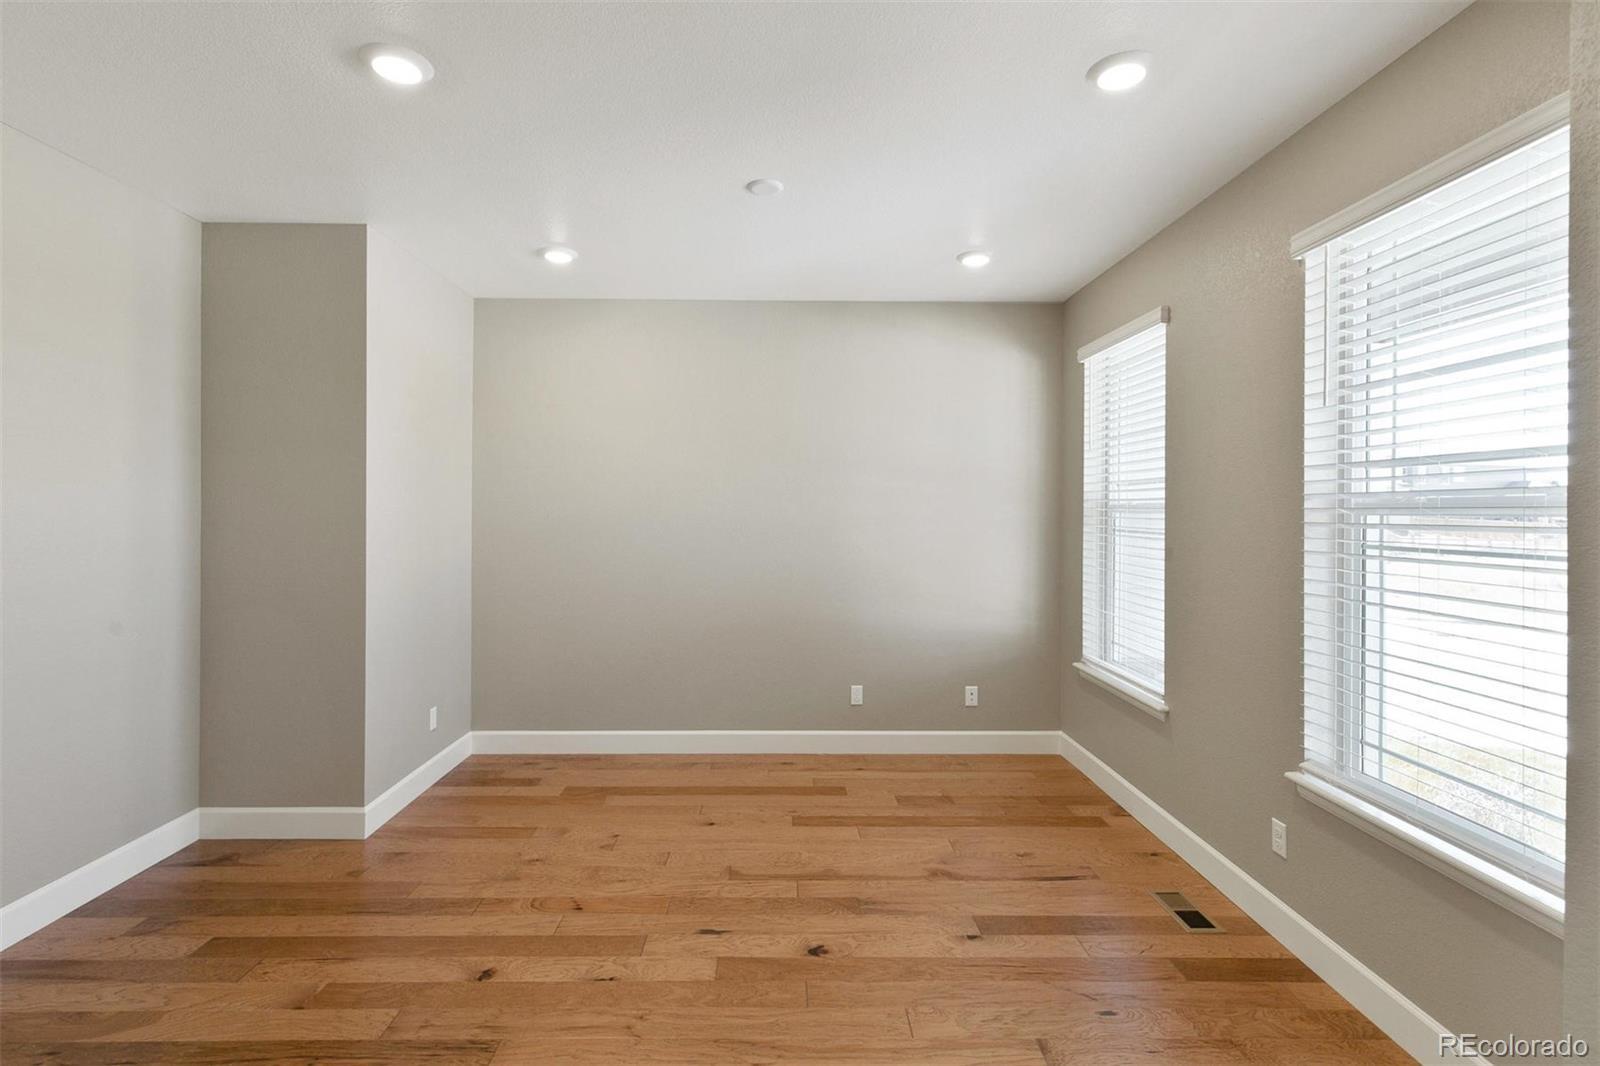 MLS# 9076258 - 5 - 1838 Pinion Wing Circle, Castle Rock, CO 80108